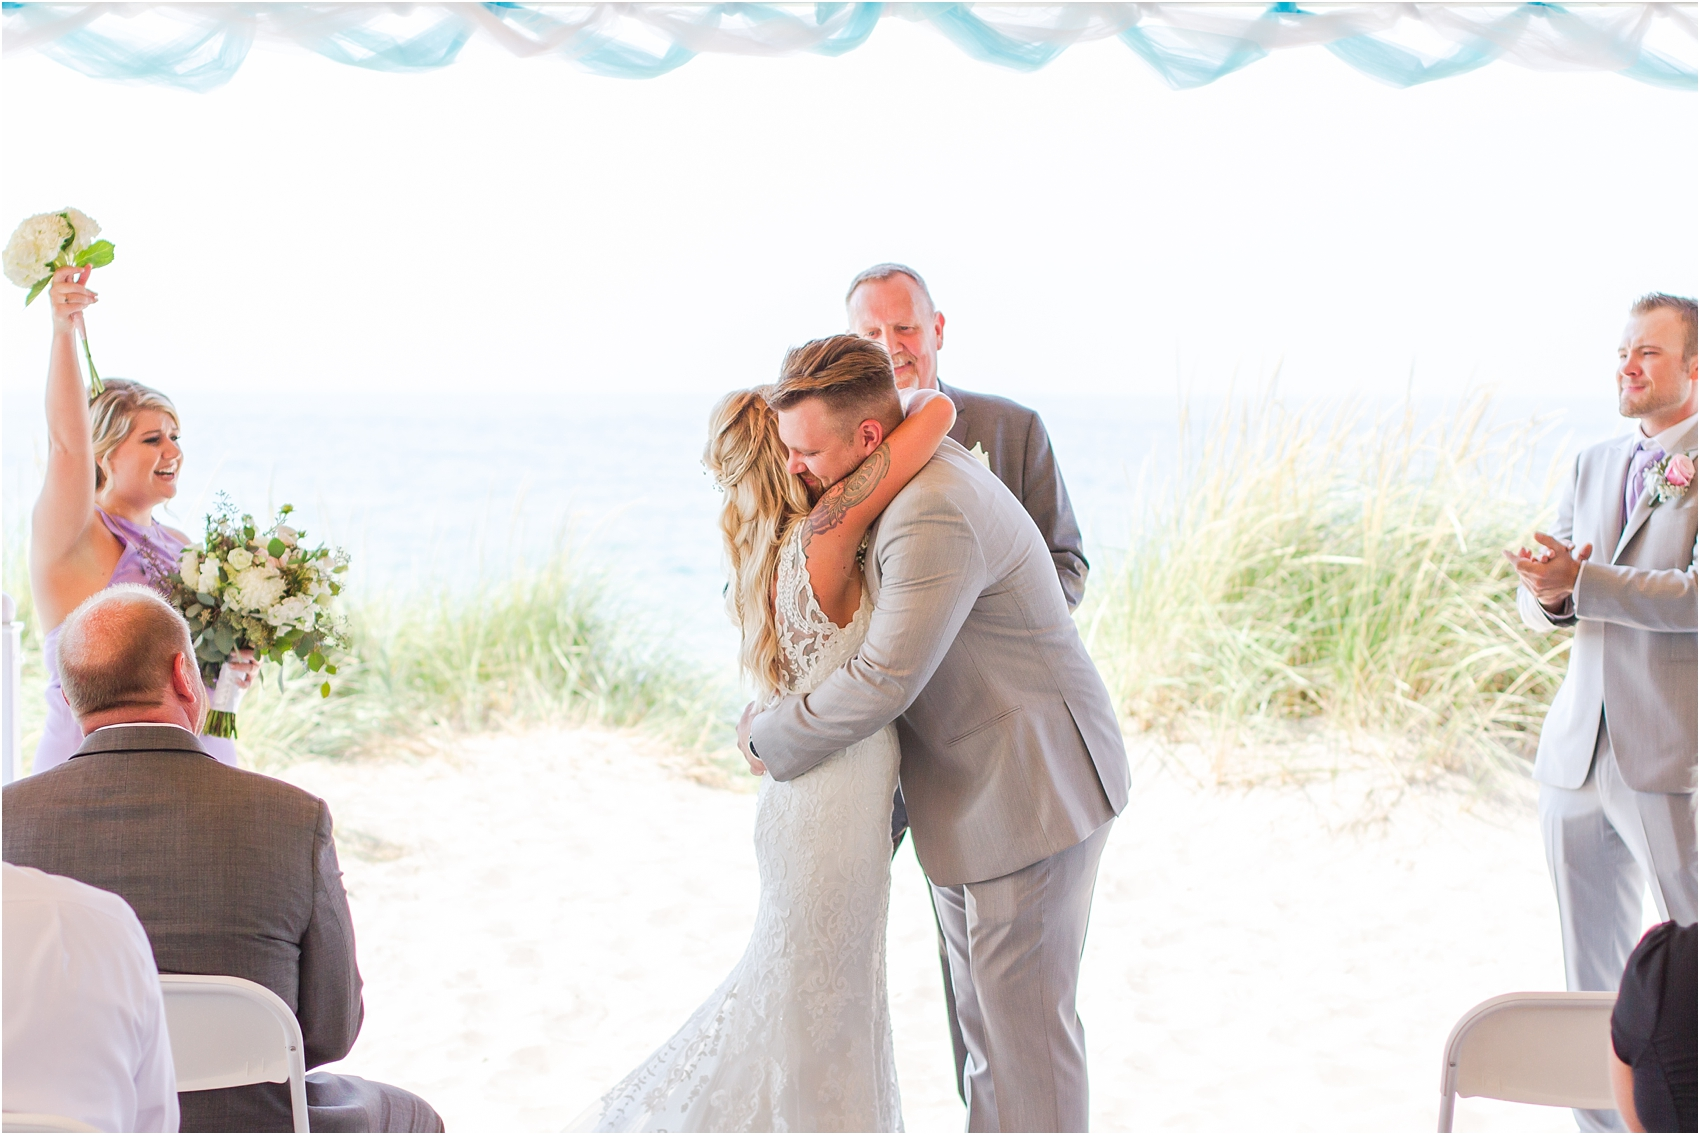 fun-whimsical-beach-wedding-photos-in-st-joseph-michigan-by-courtney-carolyn-photography_0071.jpg